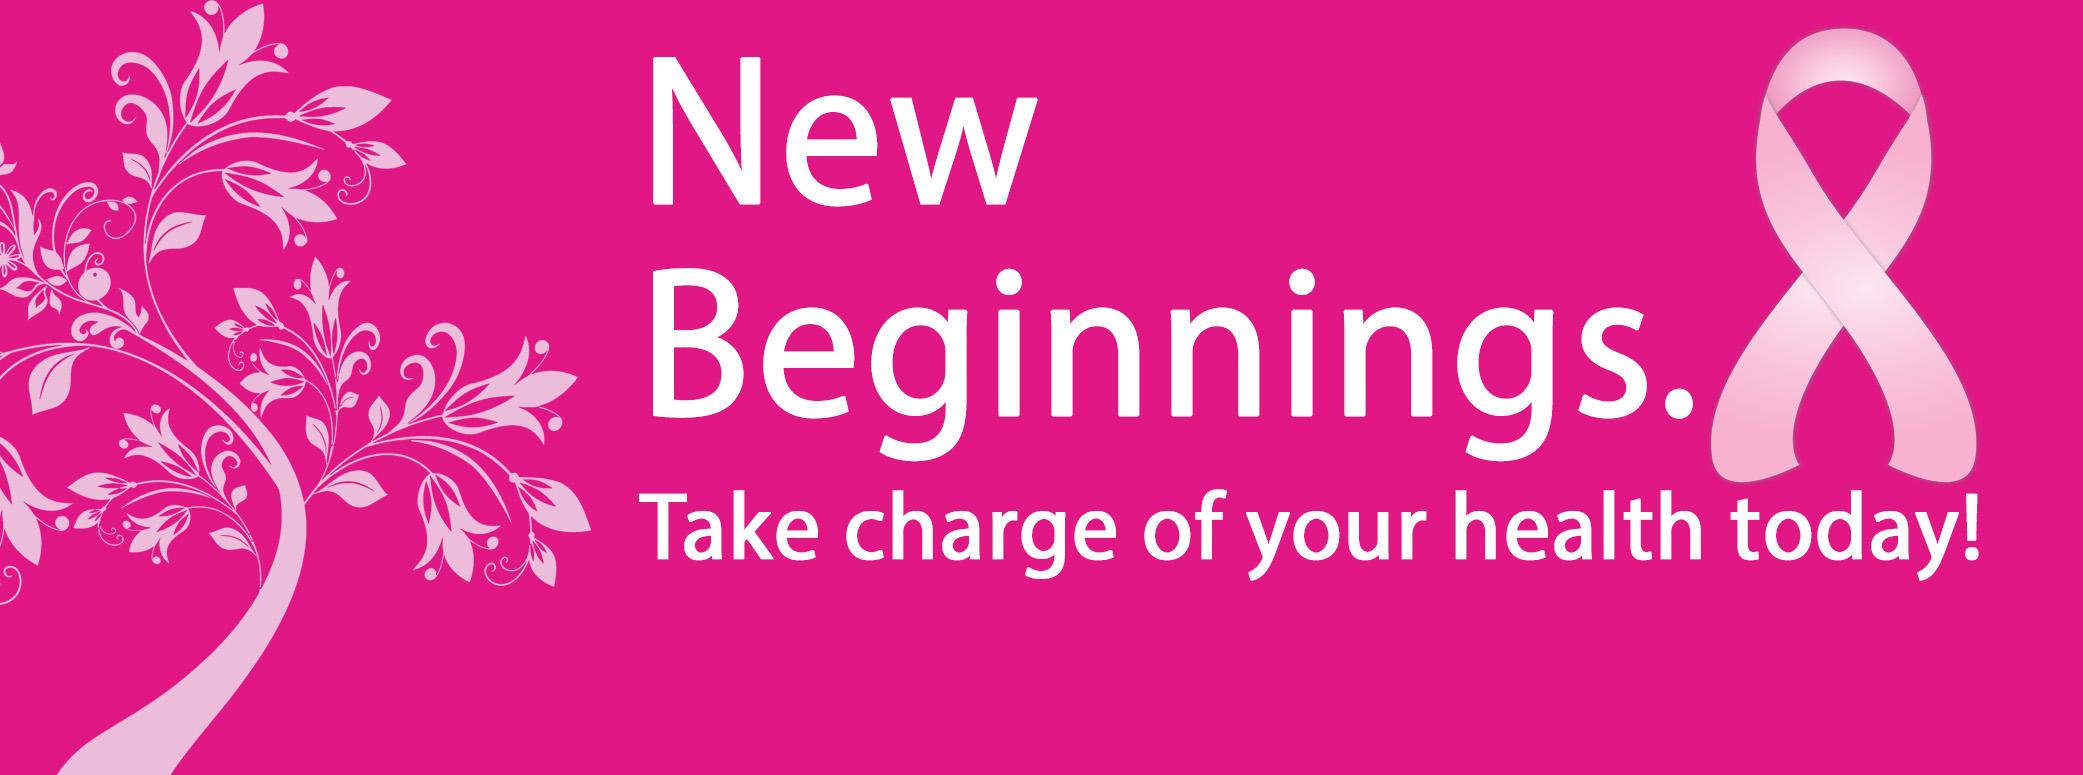 new beginnings_2021